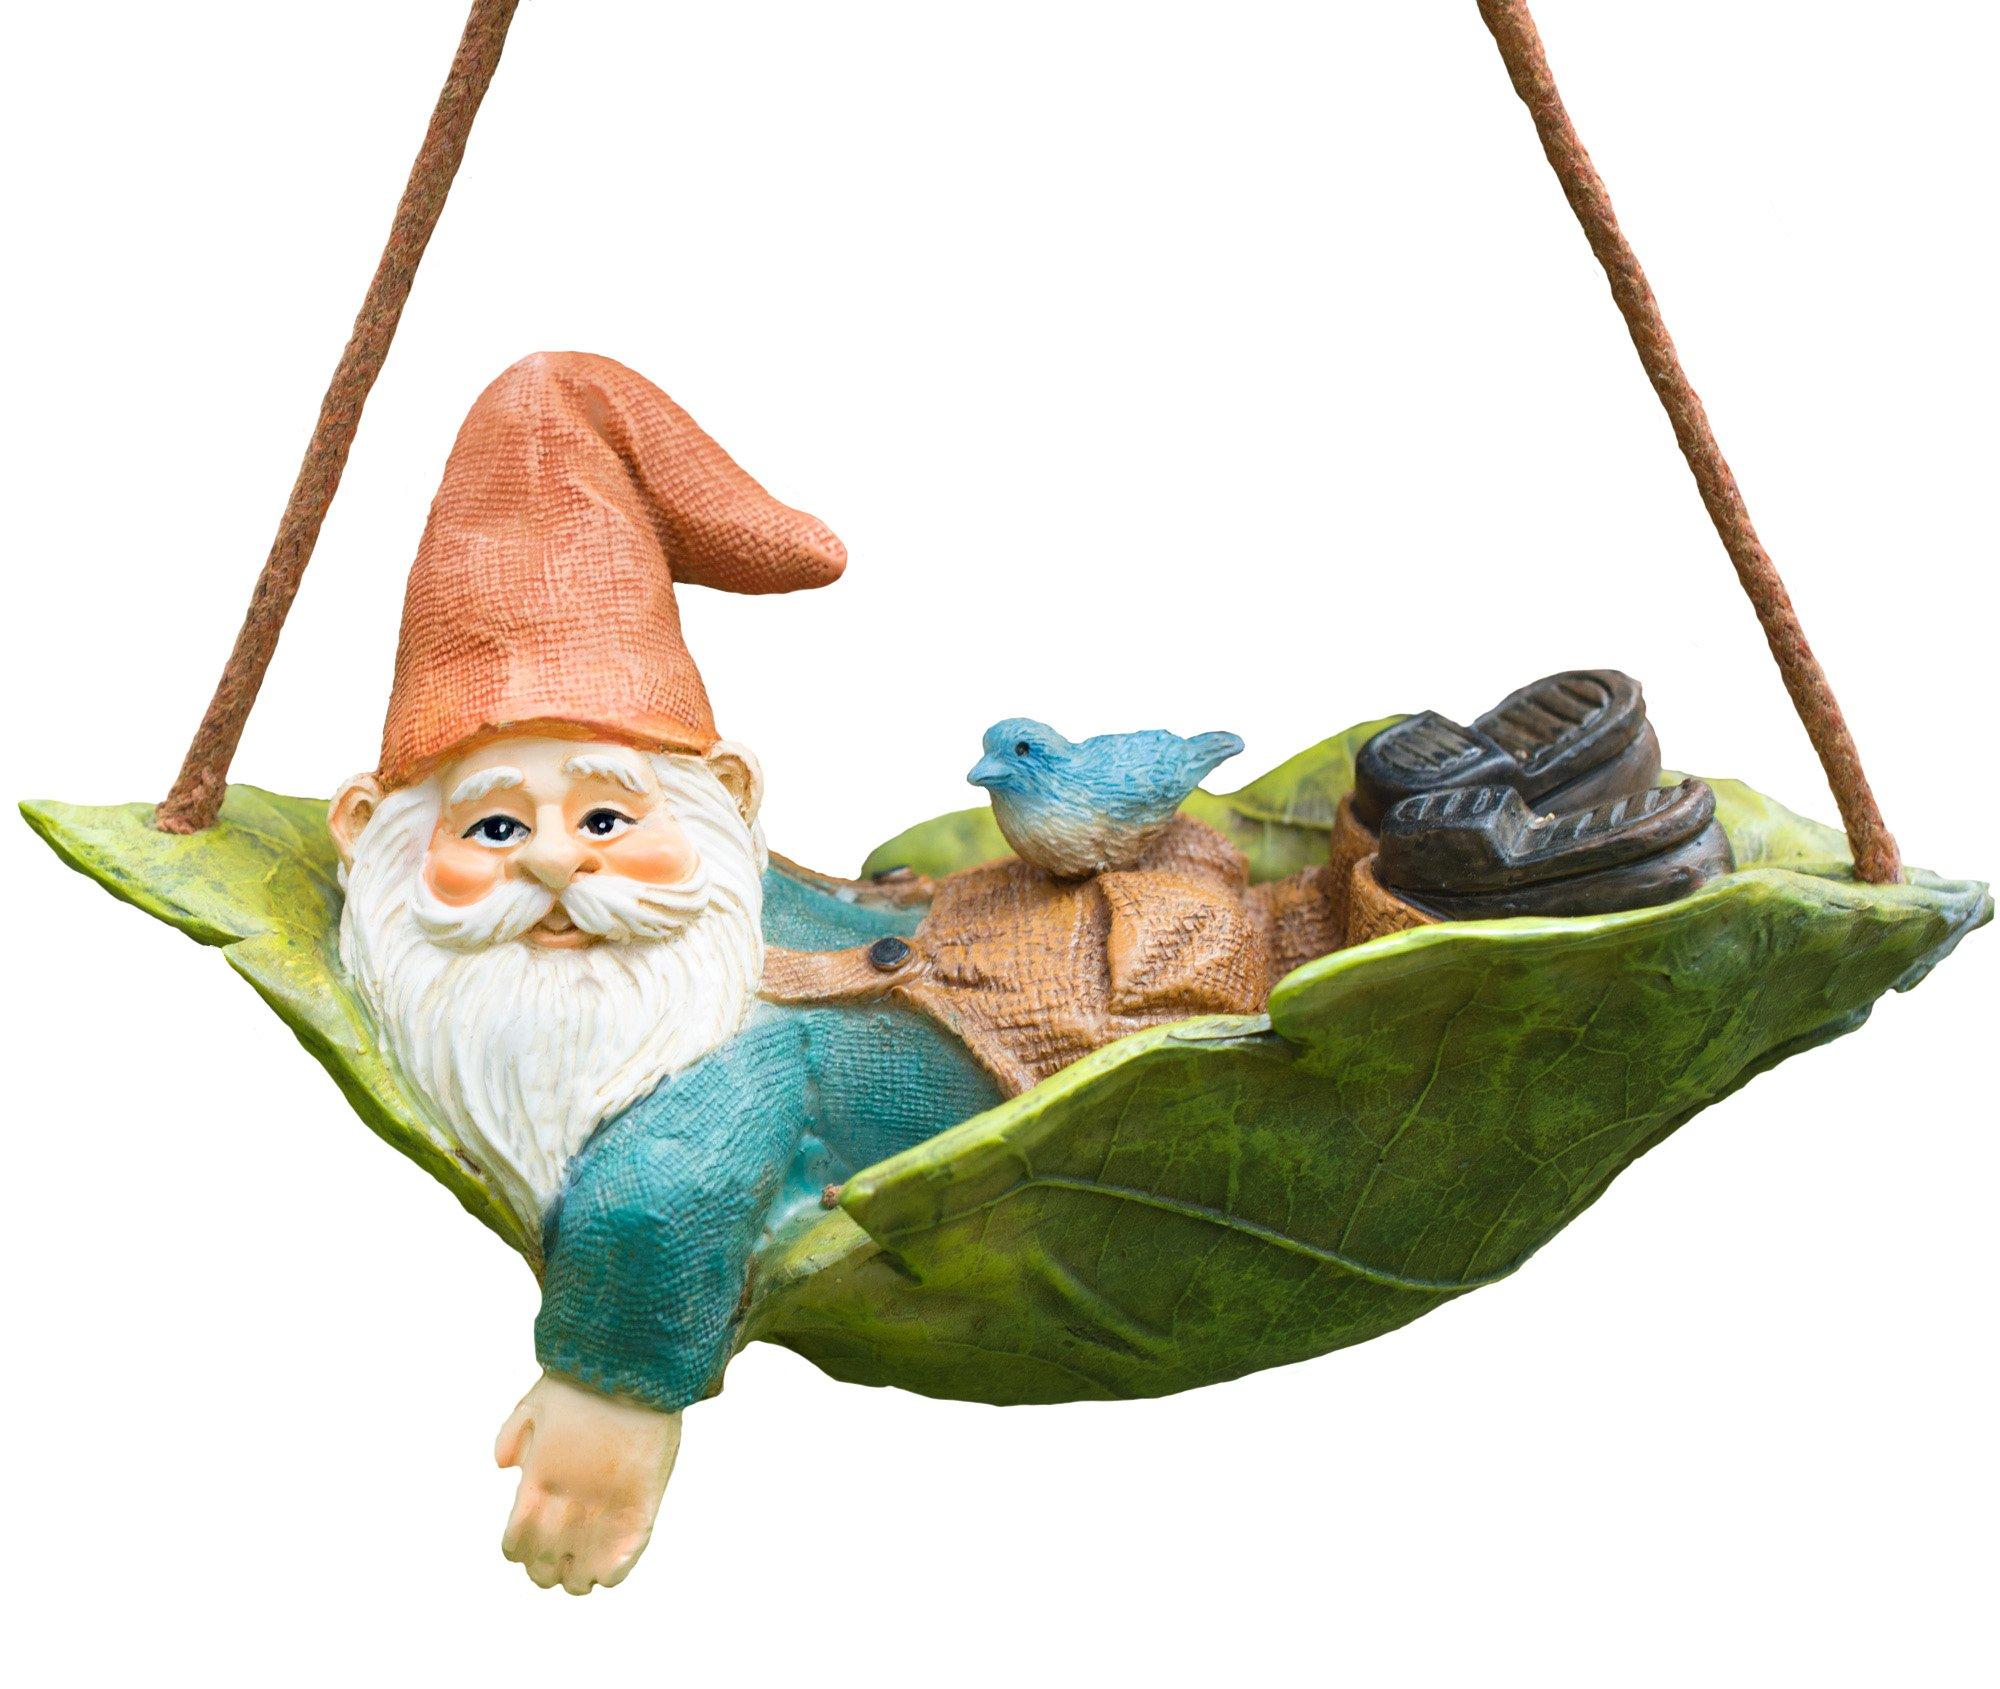 Twig & Flower Harley The Happy Miniature Leaf Hammock Gnome with His Best Blue Bird Buddy Jay